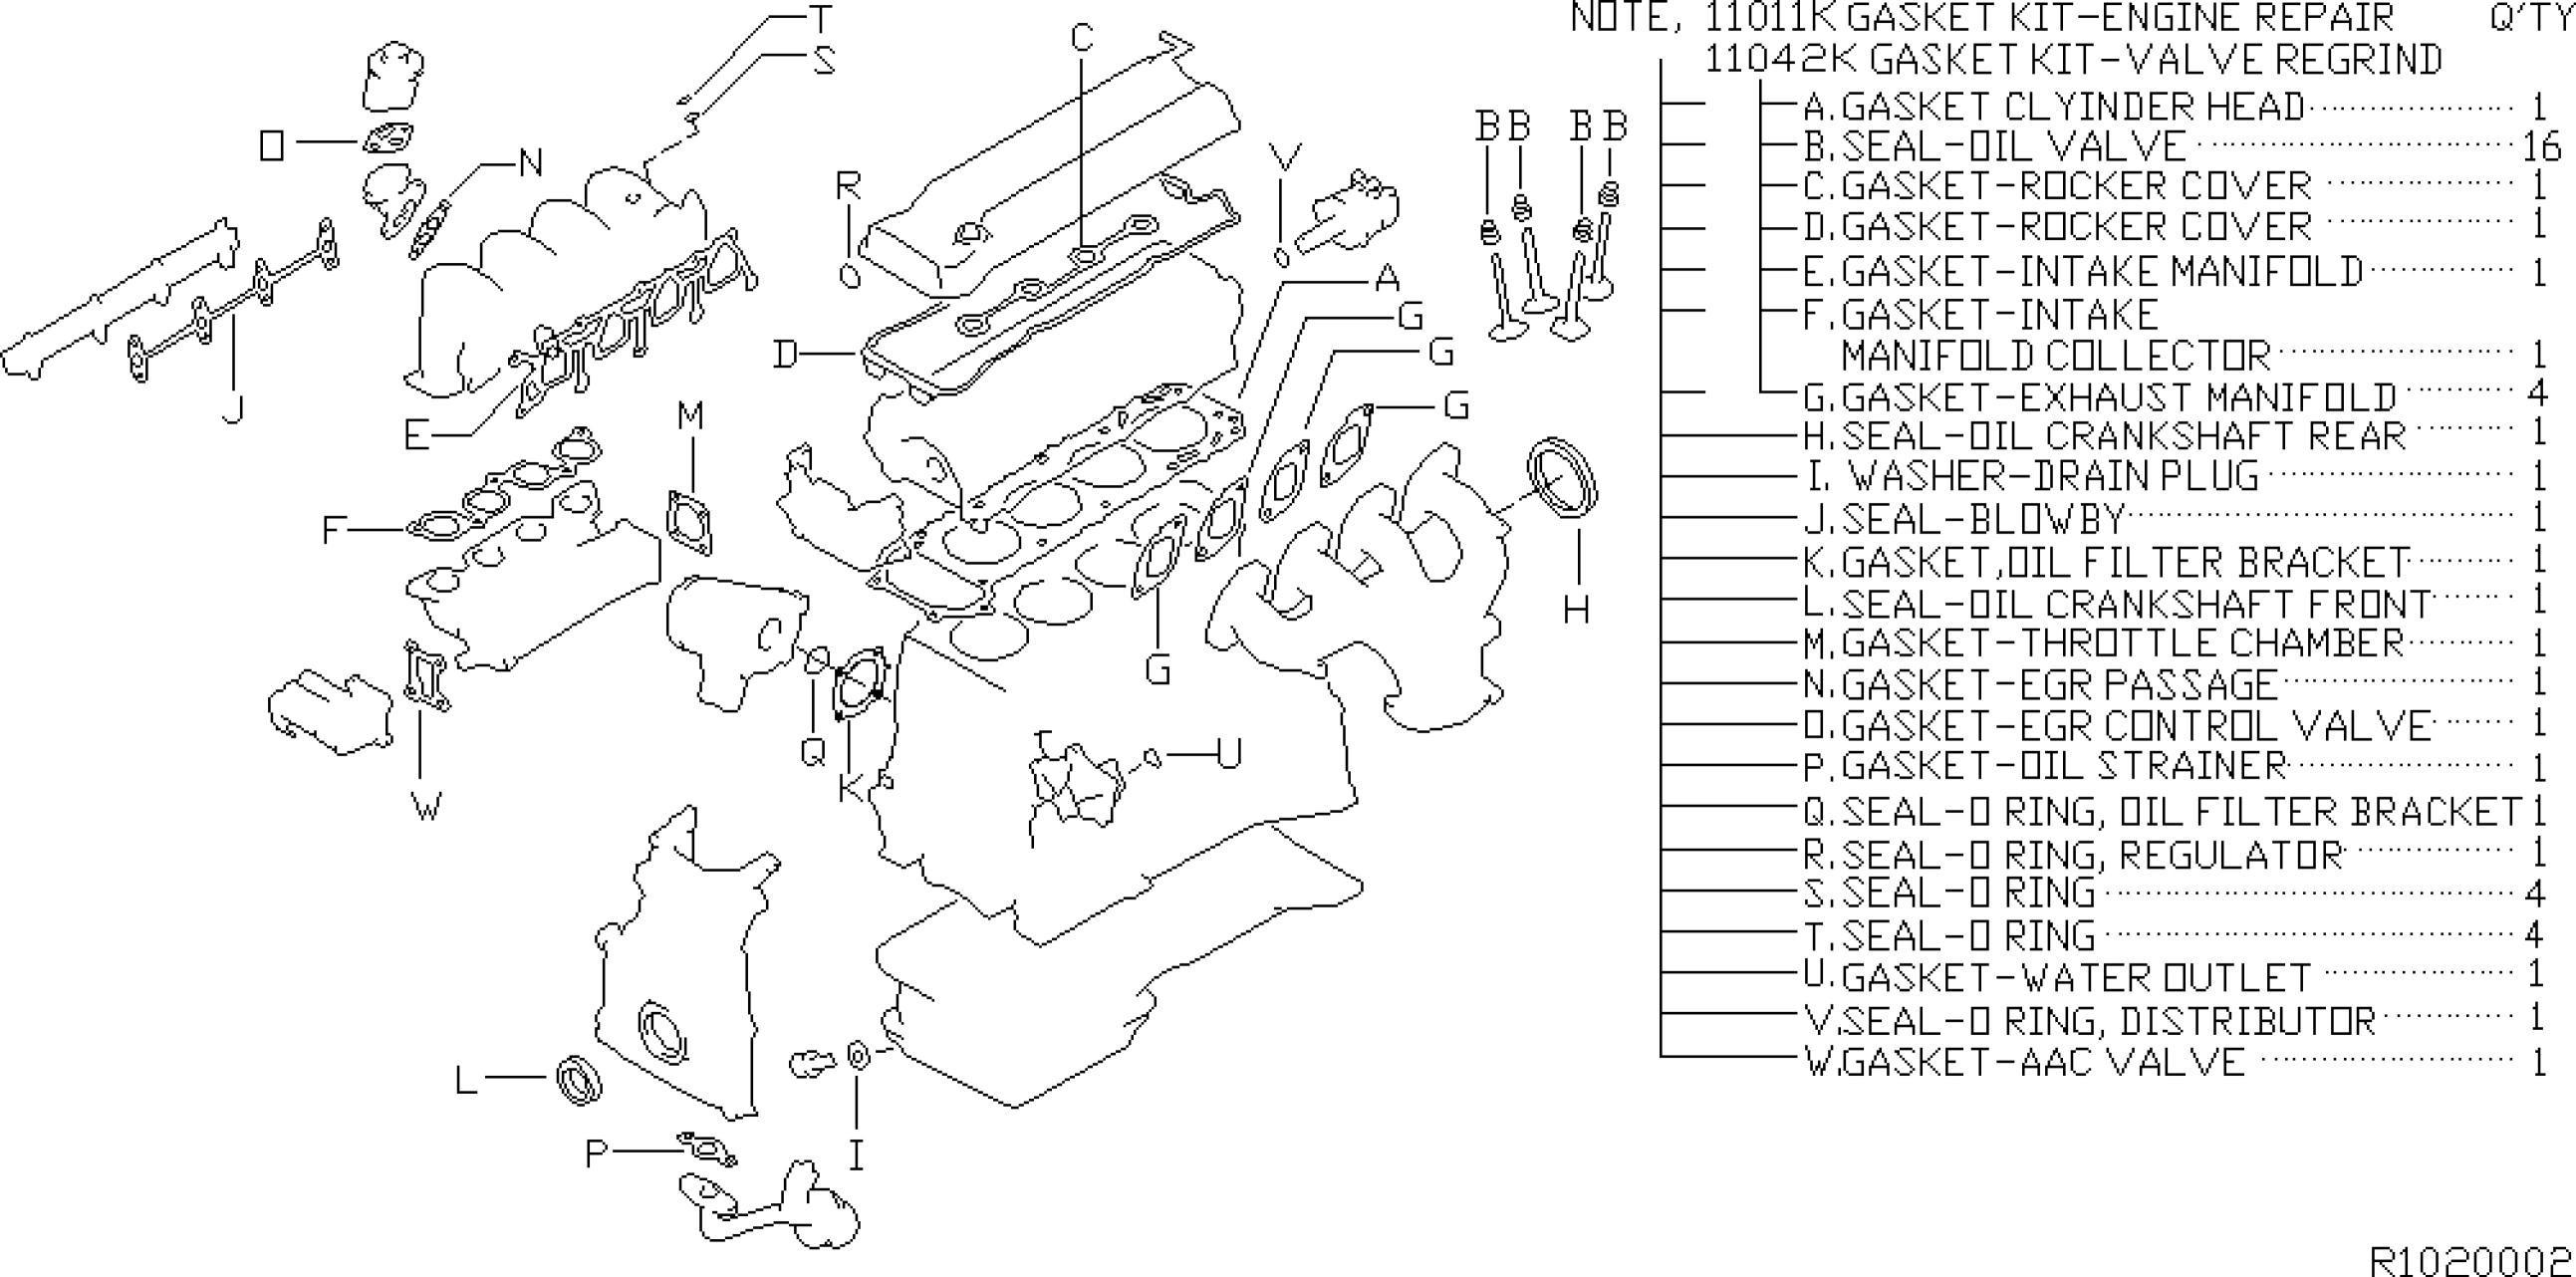 2002 Nissan Altima Engine Diagram Sentra 1997 2005 2000 Of